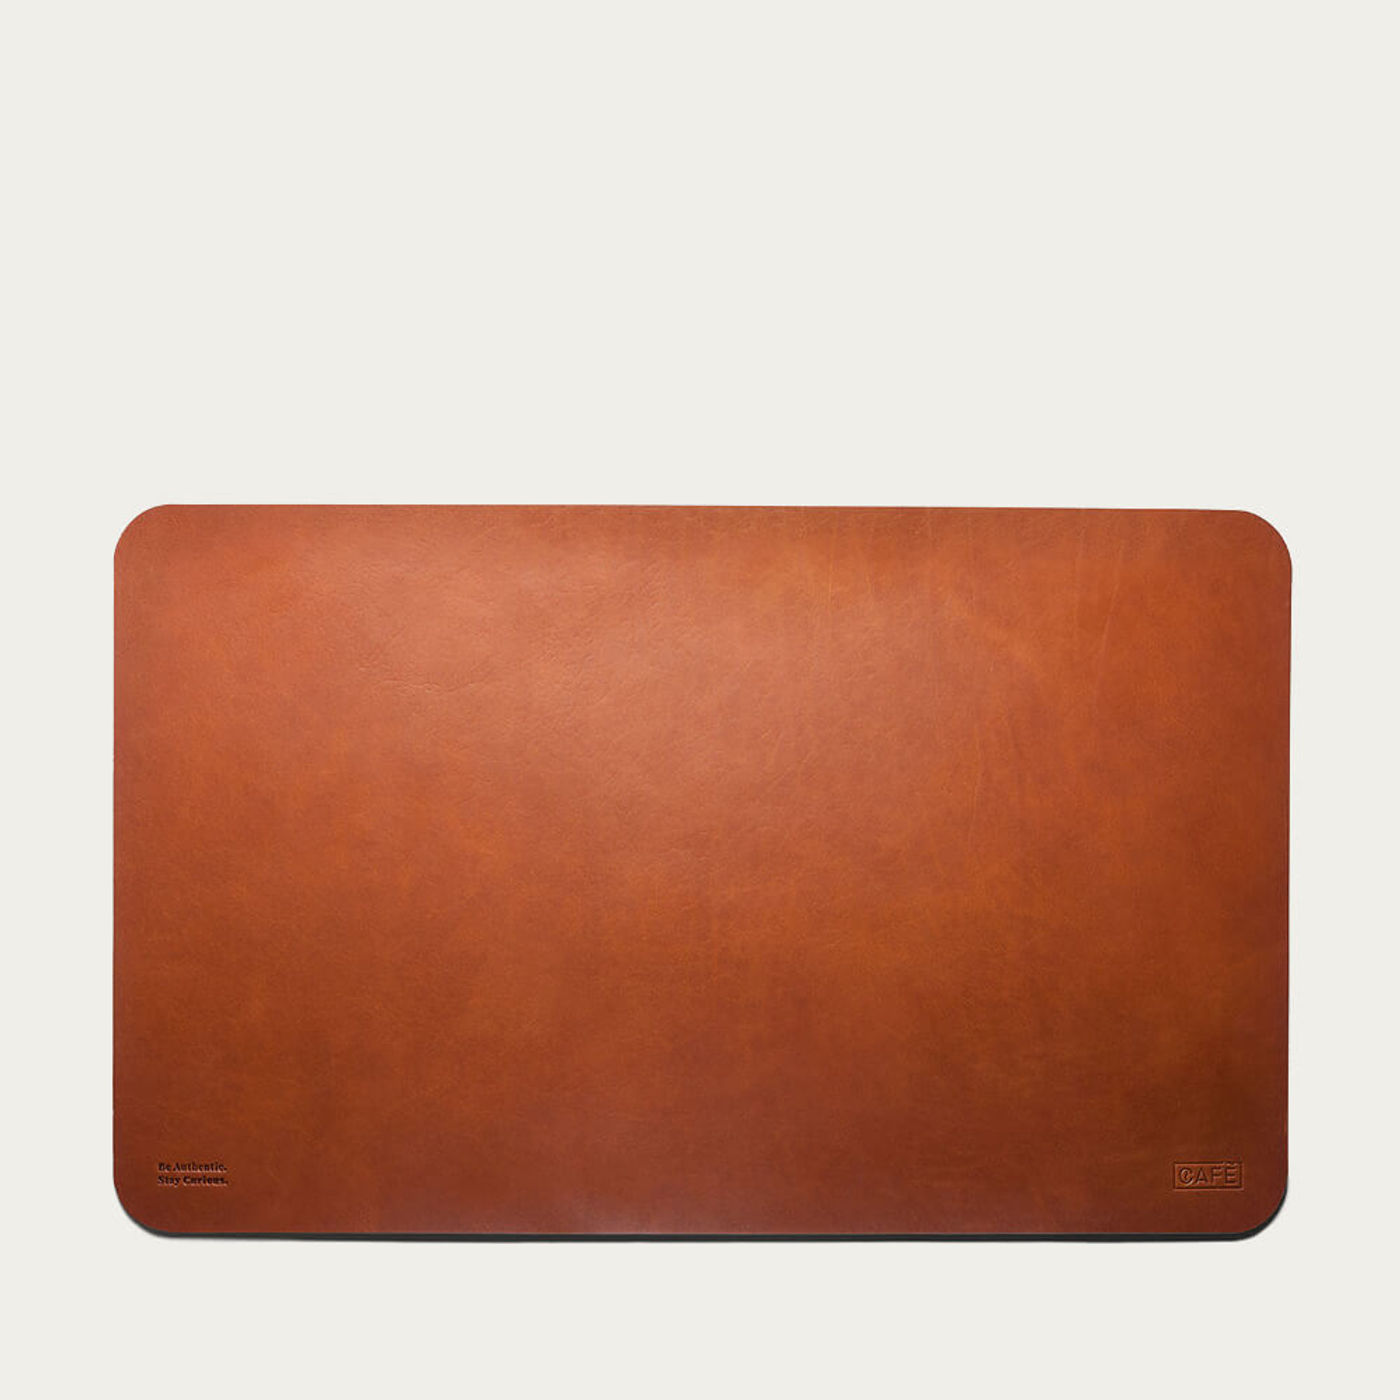 Roasted Leather Desk Pad | Bombinate